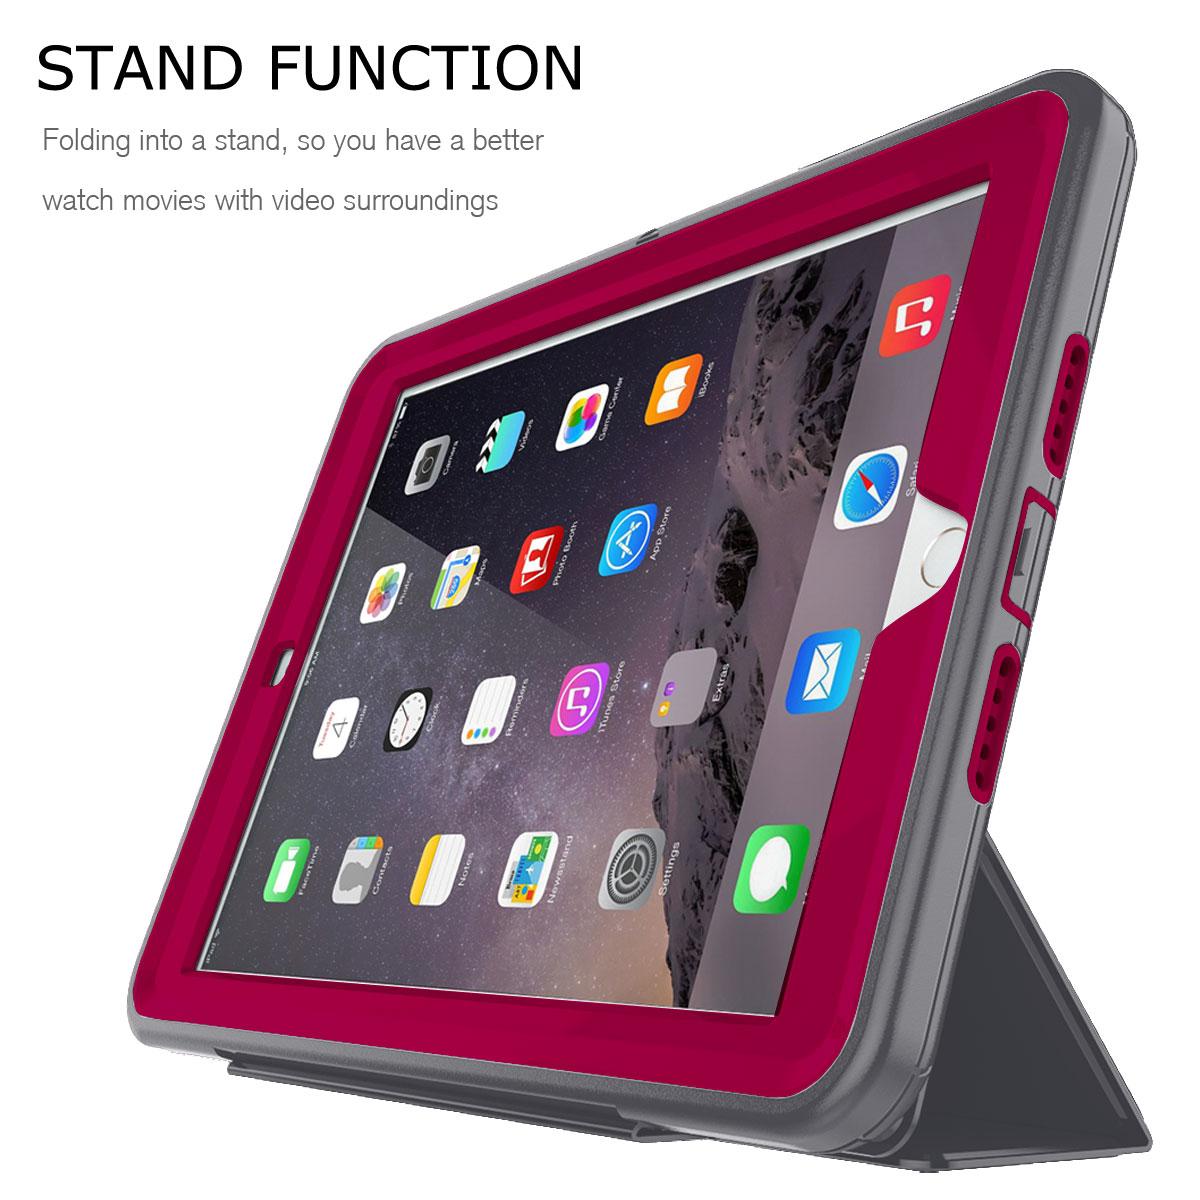 heavy duty smart cover shockproof case for apple ipad 9 7. Black Bedroom Furniture Sets. Home Design Ideas